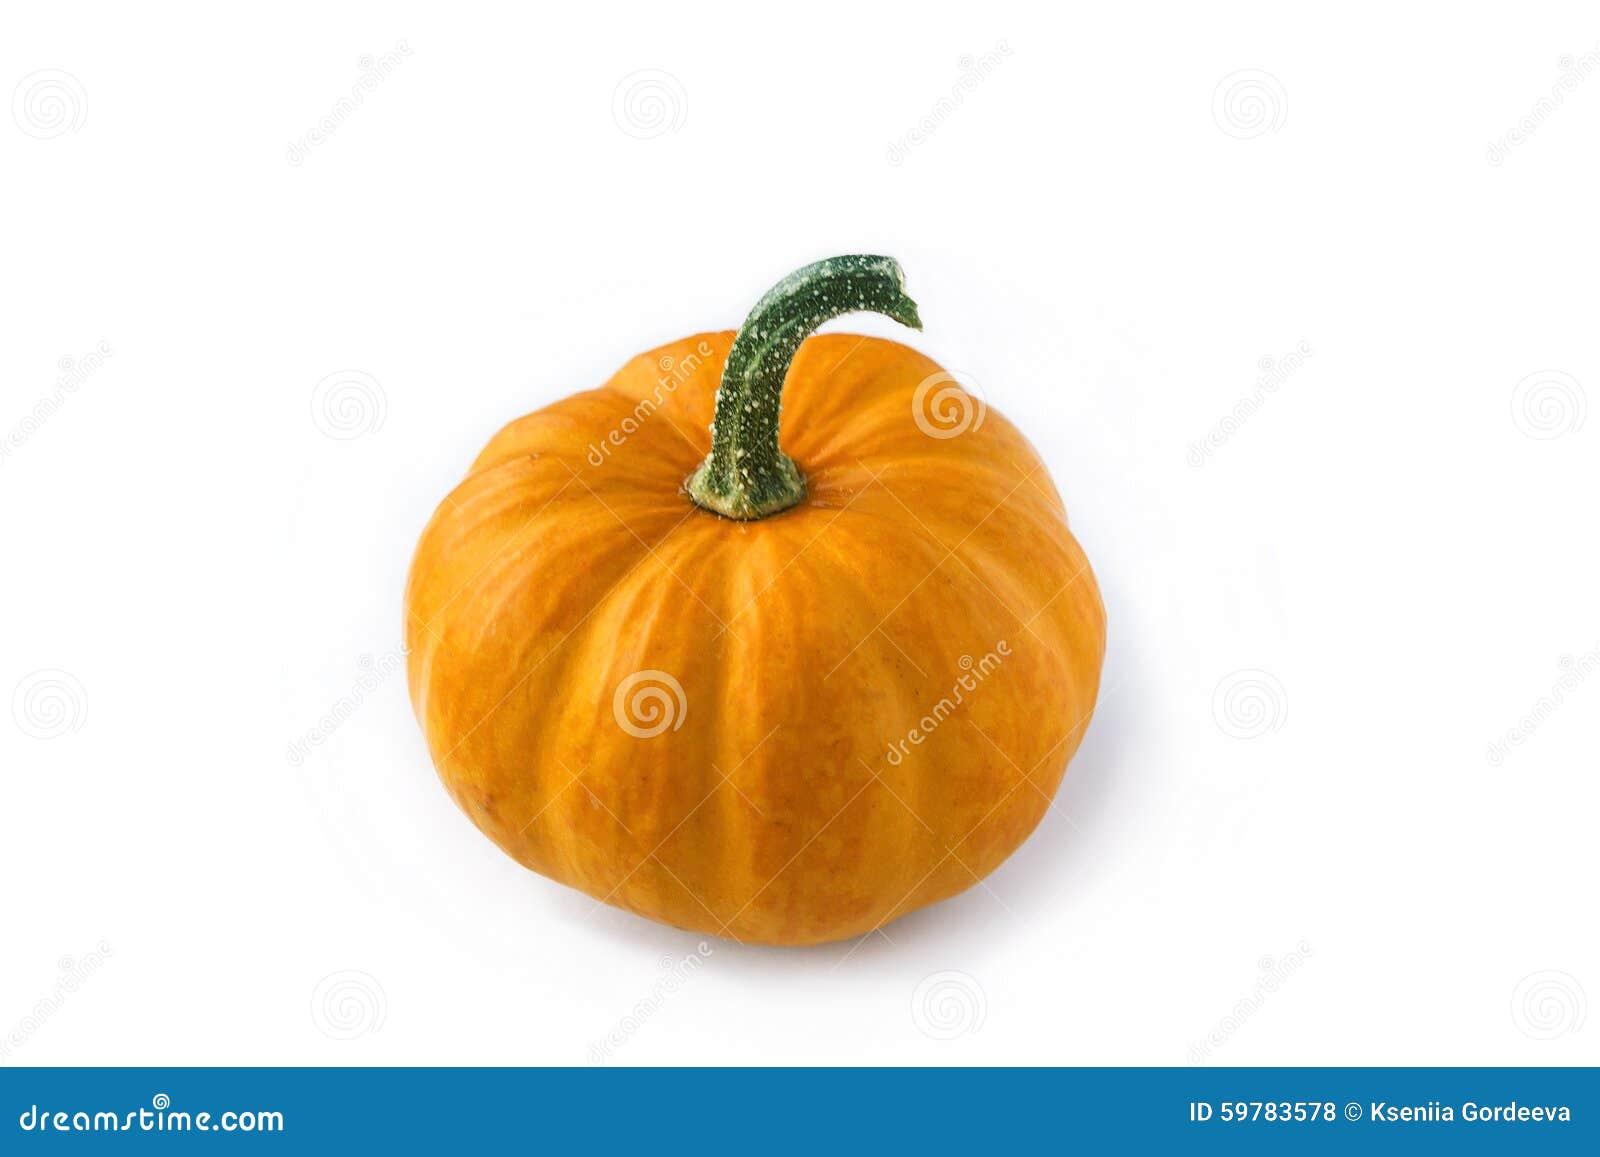 Mini Pumpkin – Jack Be Little | Autumn Harvest Pumpkins